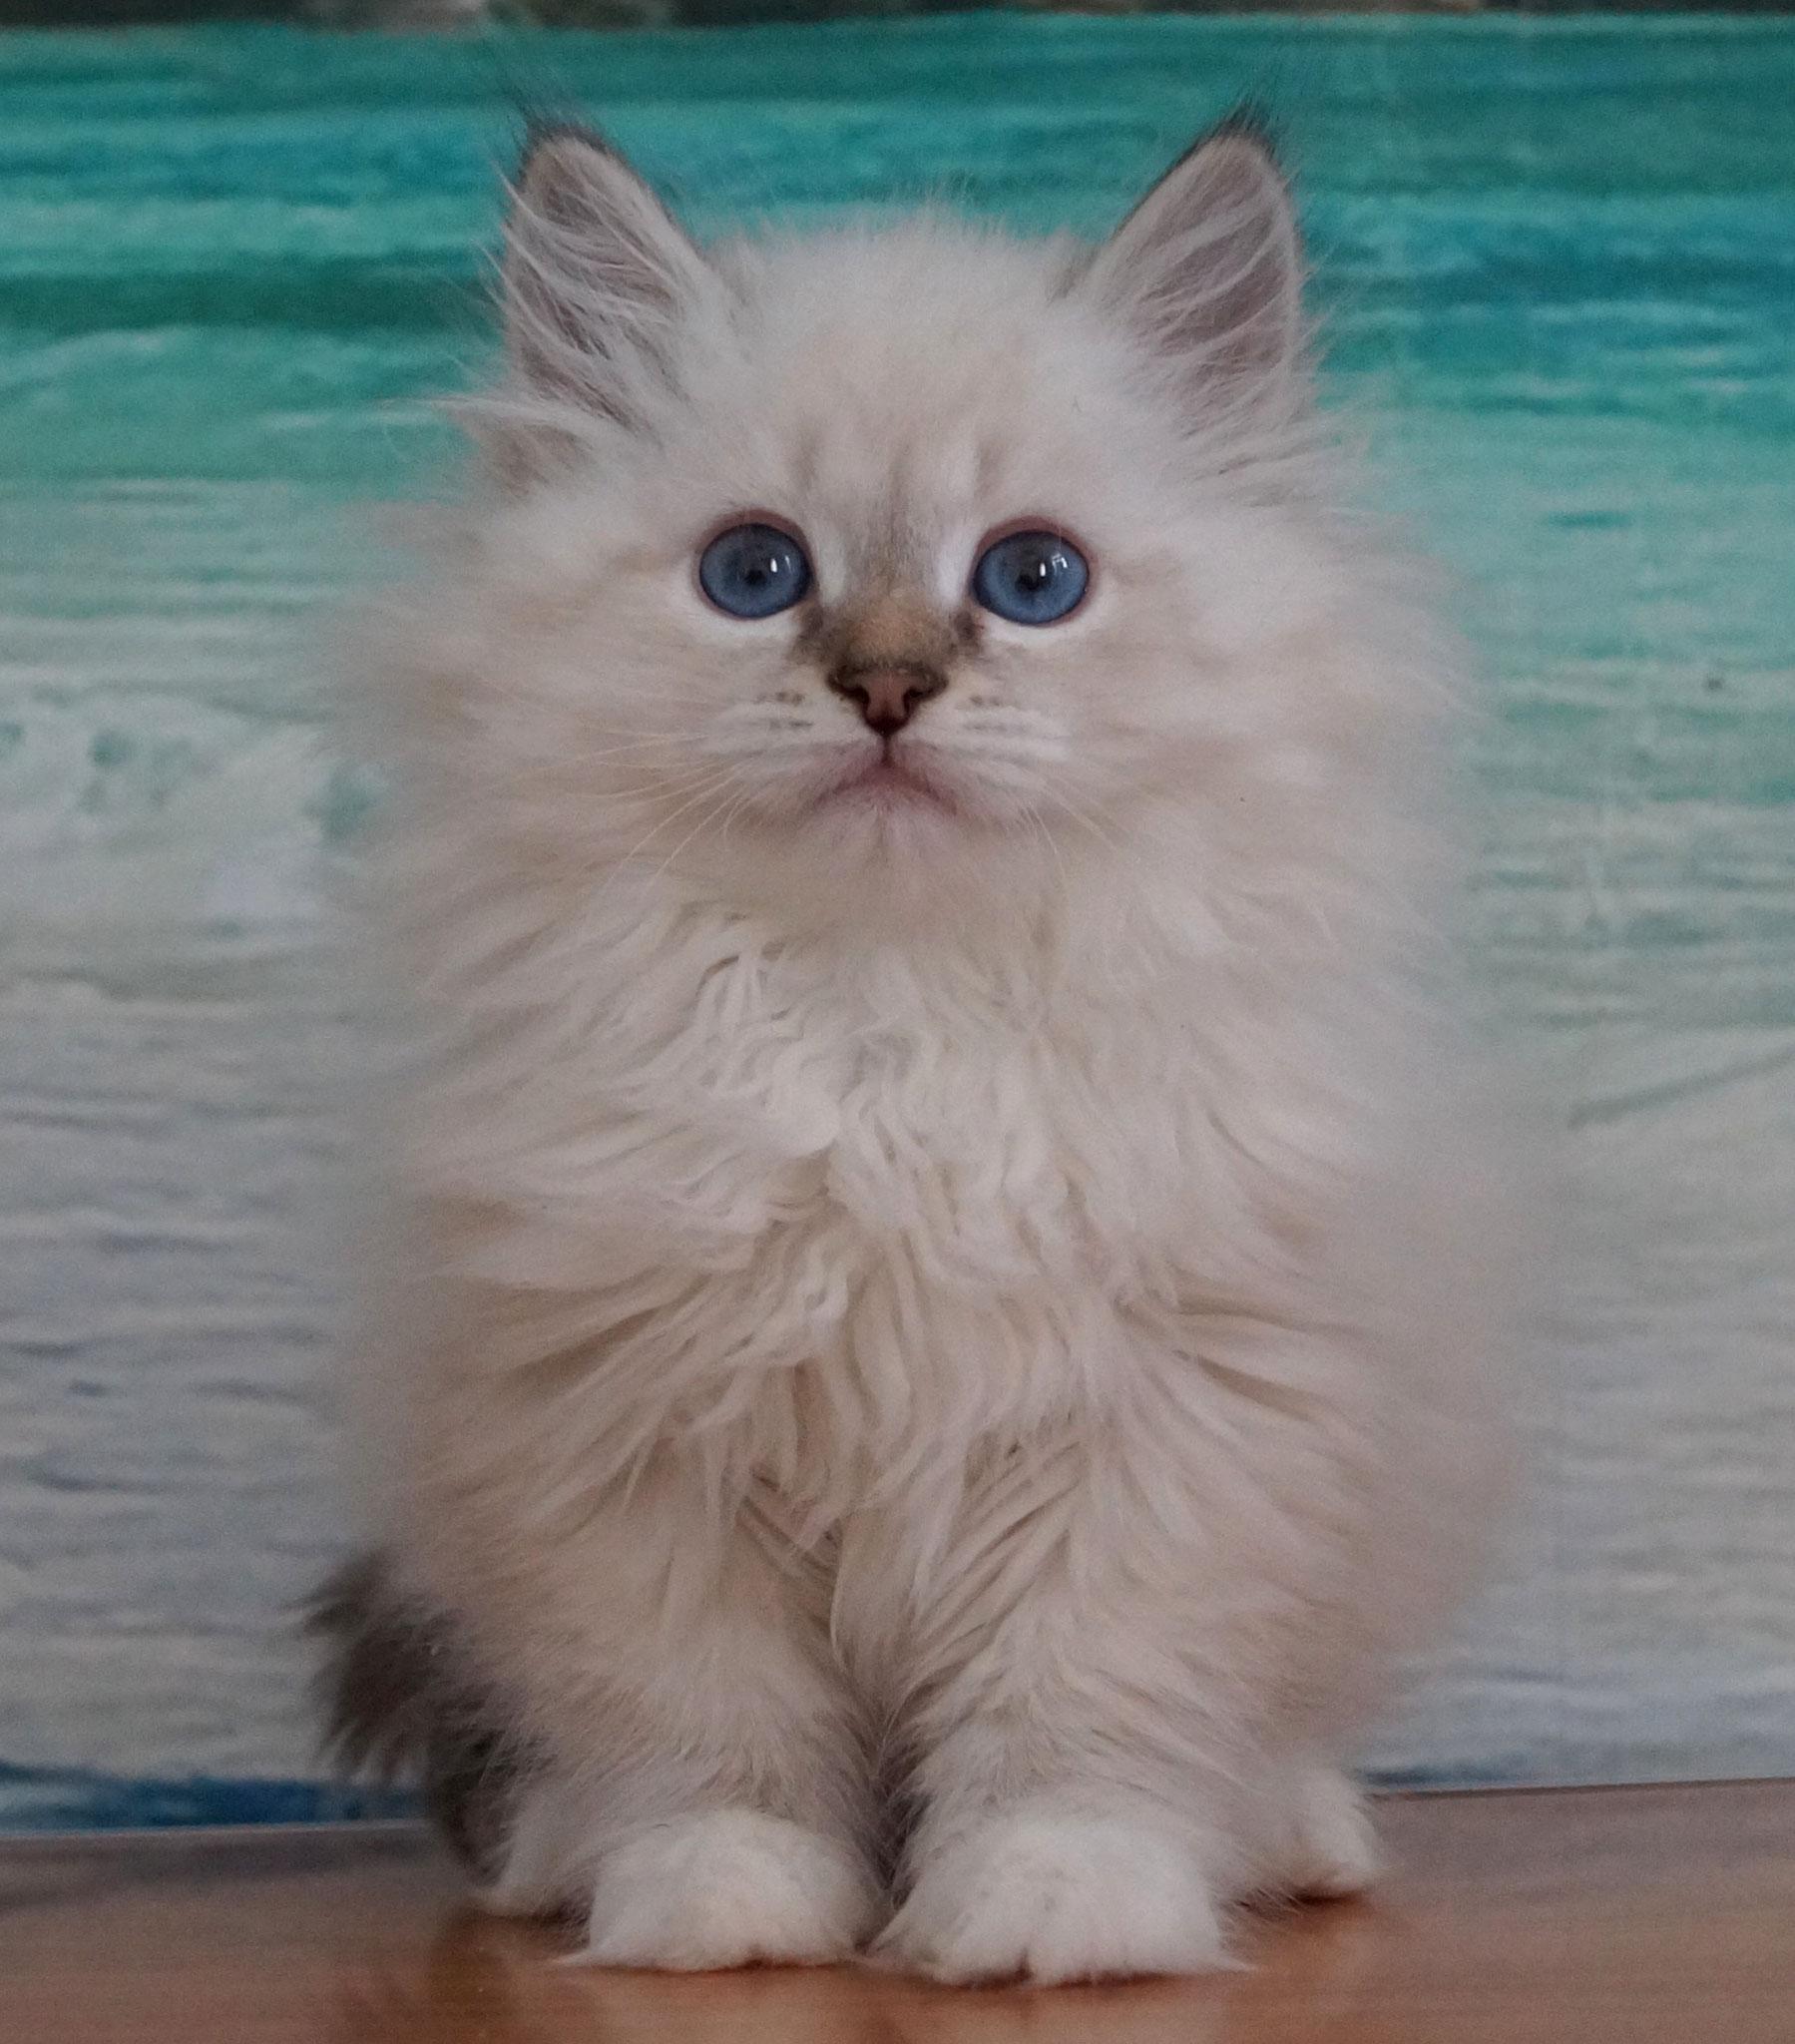 Раймонд, кот, окрас n 21 33 09, резерв Самара